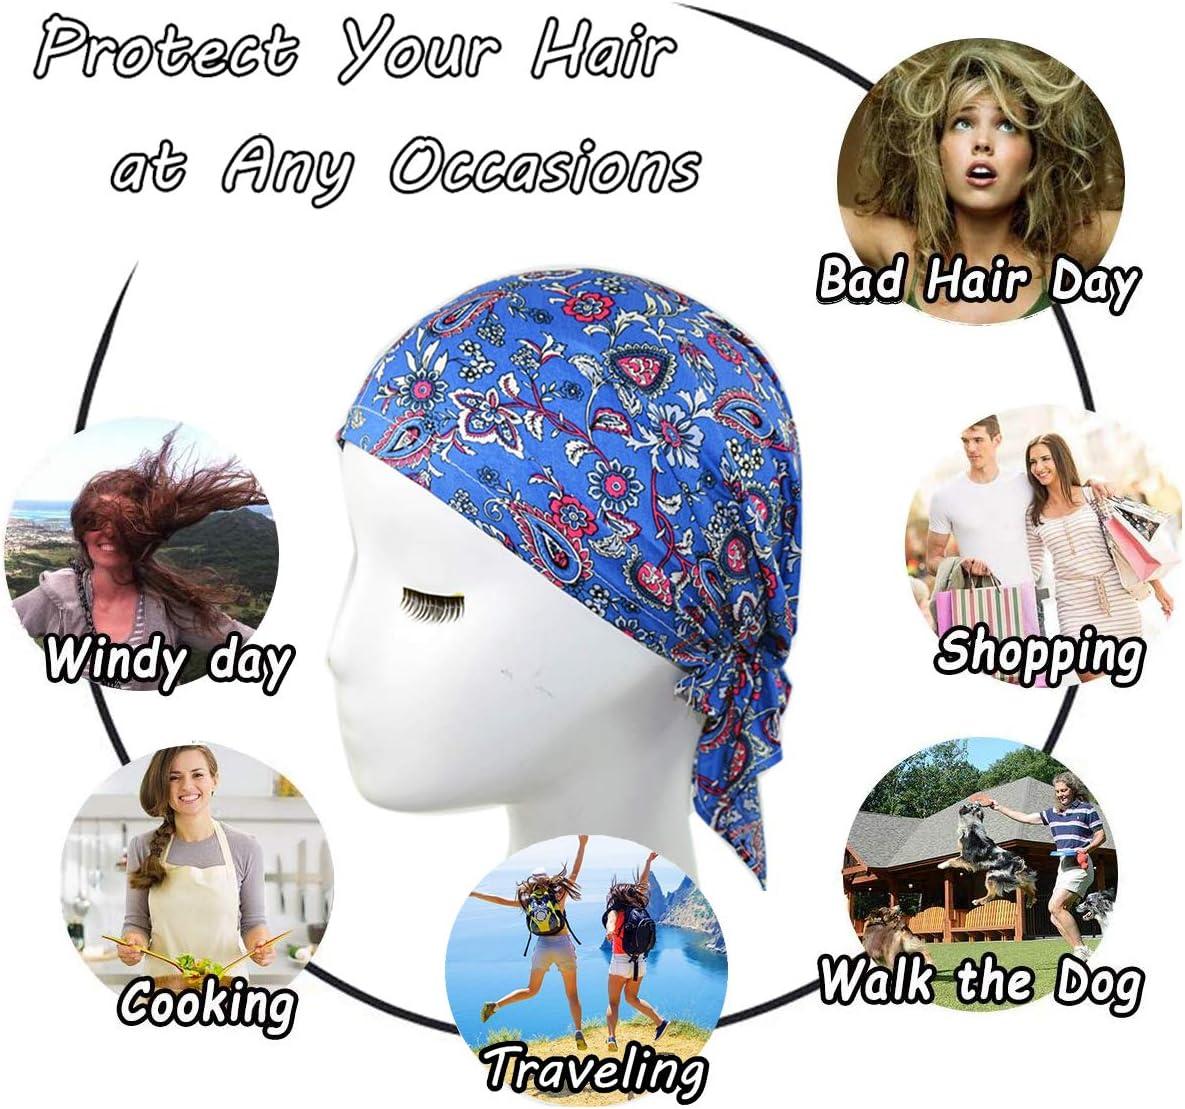 Chemo Haarausfall ZYCC Unisex Bandana Hut Baumwolle Gedruckt Turban Kopfbedeckung f/ür Krebs